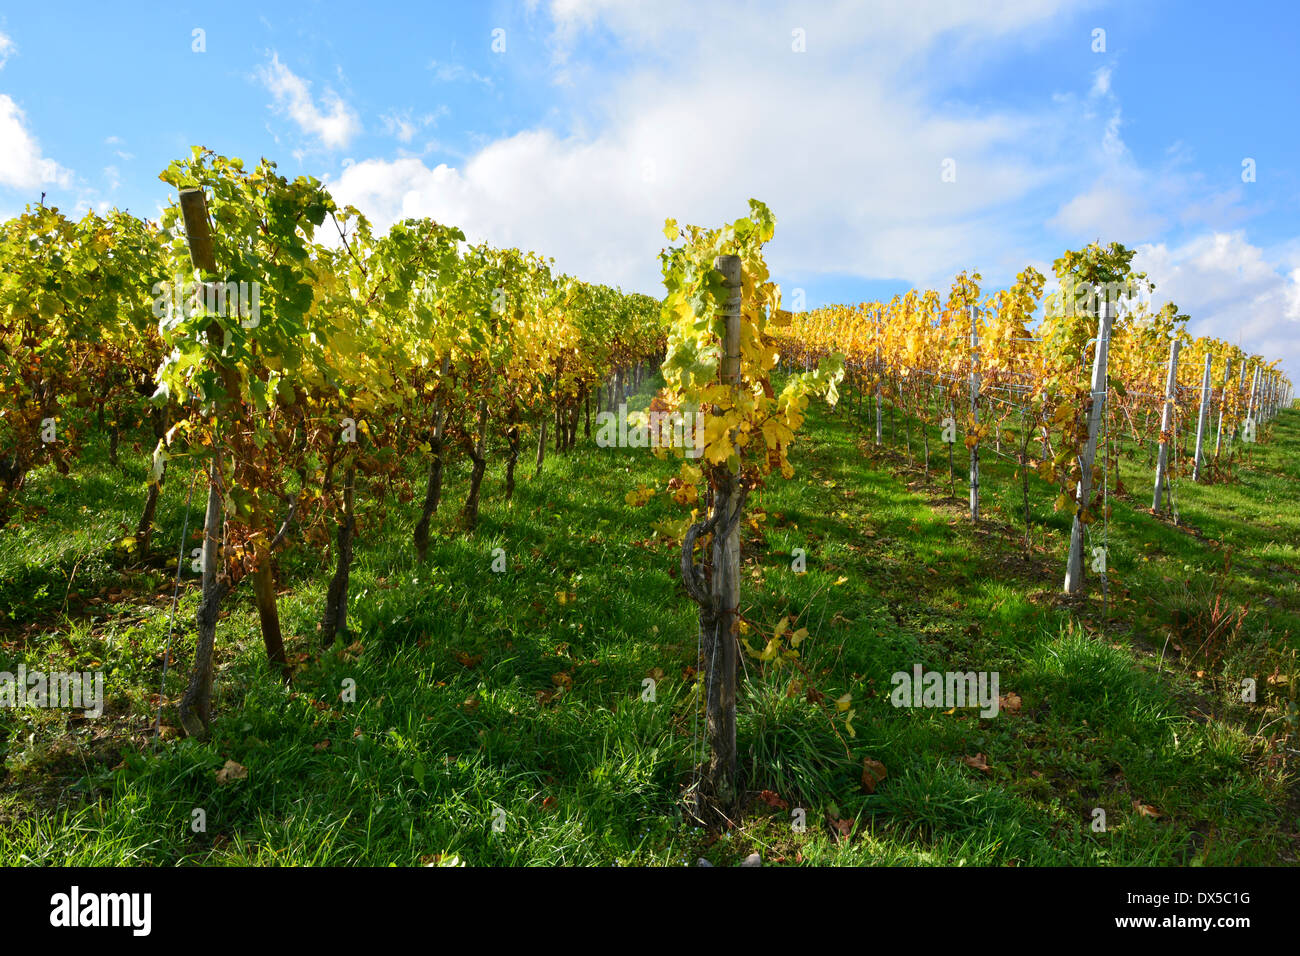 Moselle vineyard in autumn harvest landscape blue sky Germany  Weinberg Rebenlandschaft Weinbergslandschaft im Herbst Mosel Stock Photo